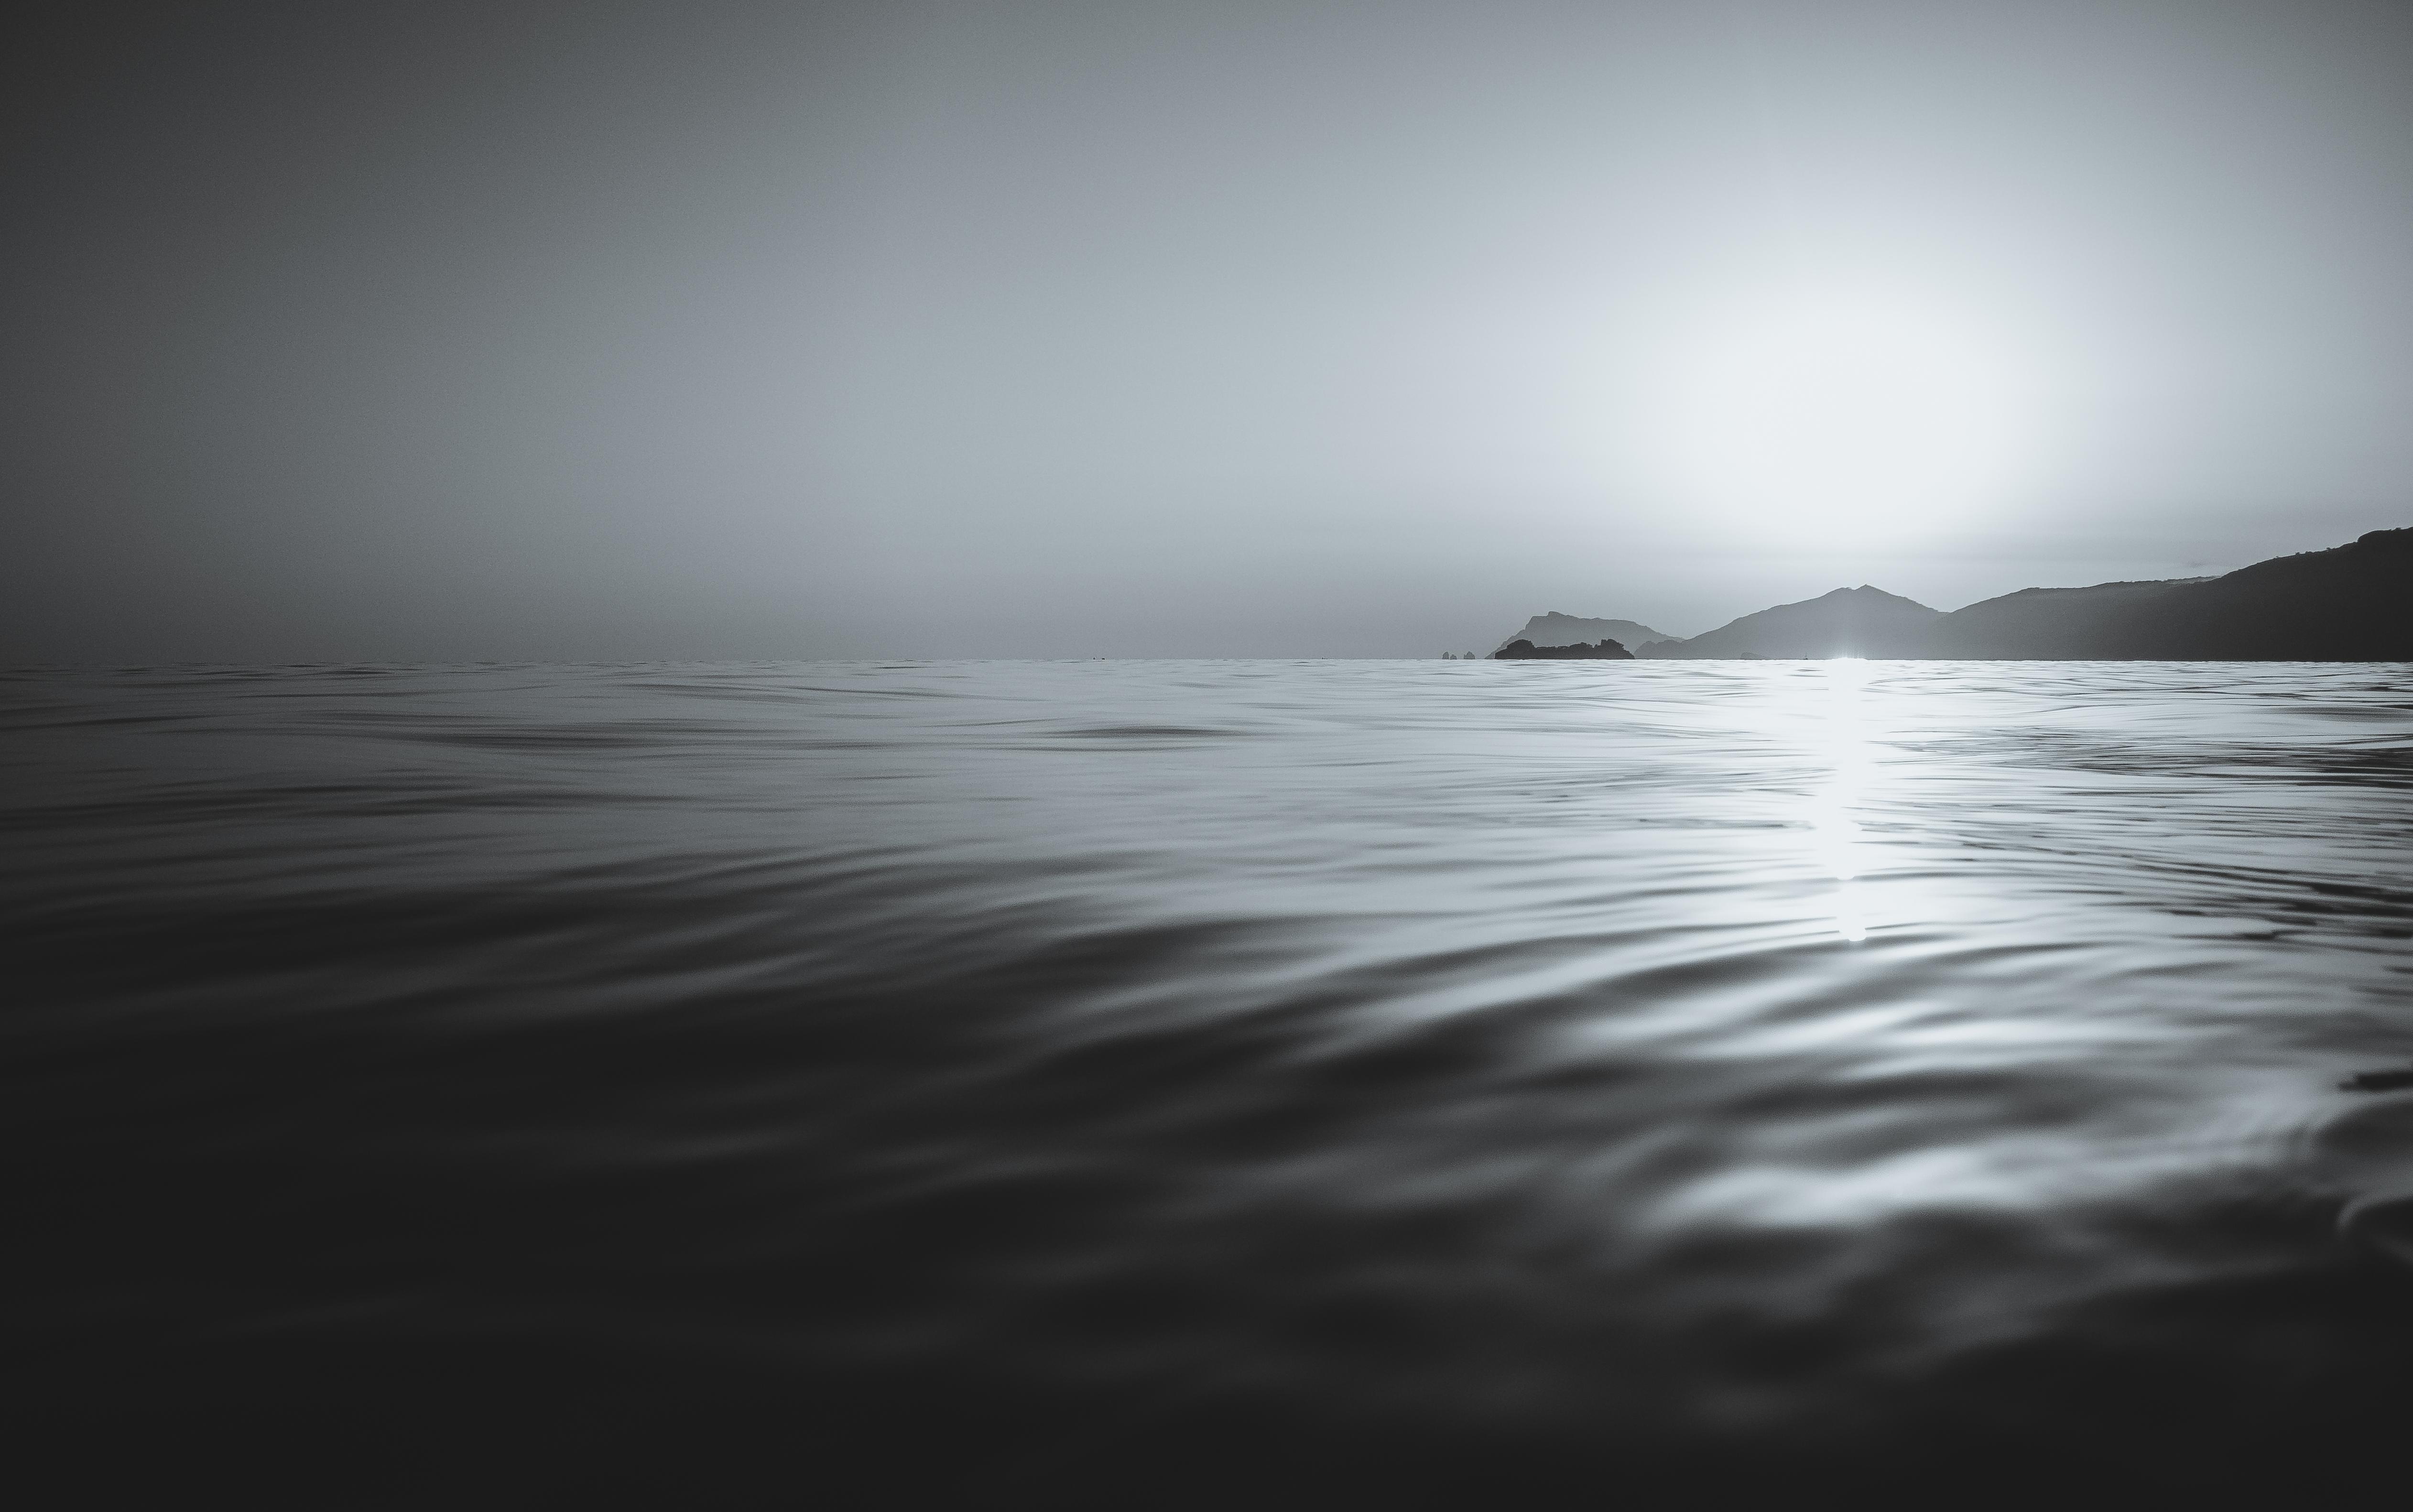 Black And White Calm Coast Islands Sea Sunset Waves 4k Wallpaper